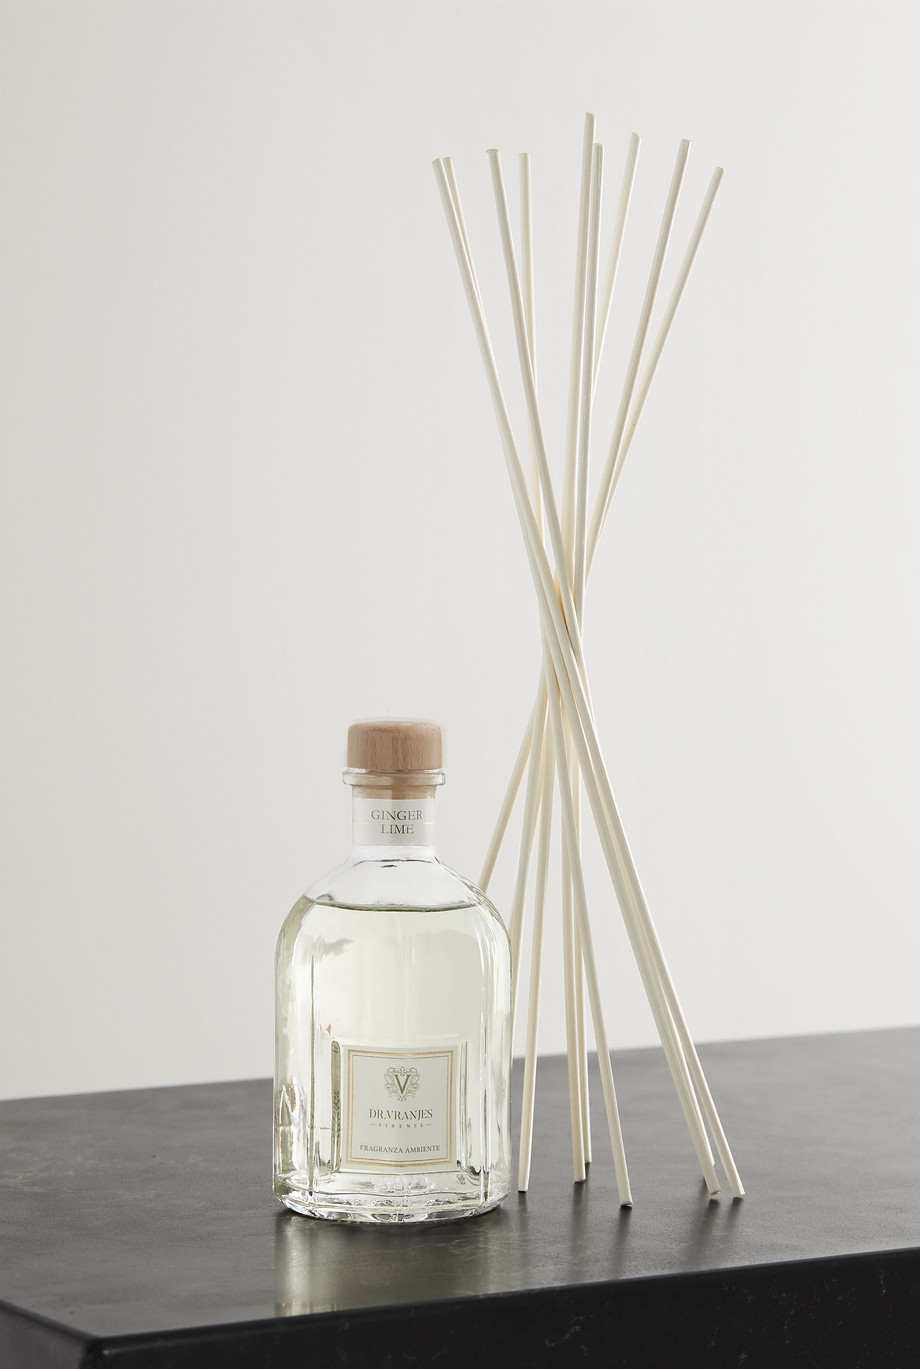 Dr. Vranjes Firenze Diffuseur de parfum, Ginger Lime, 250 ml